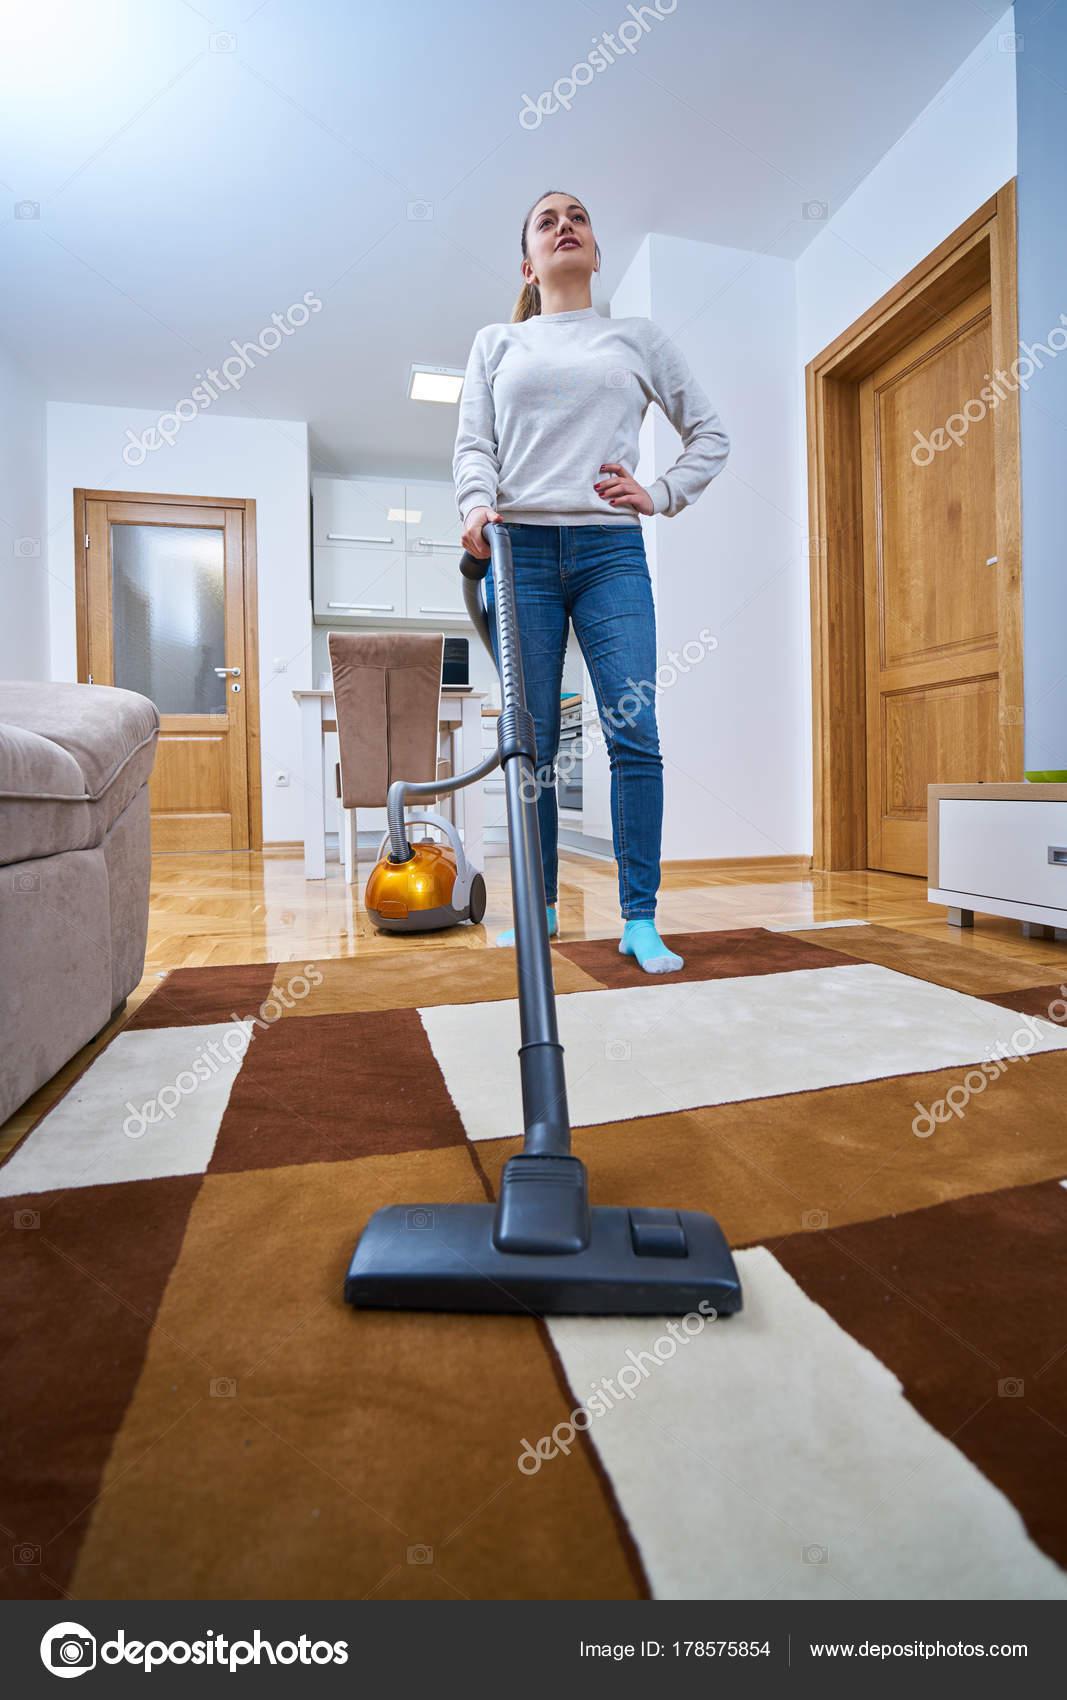 5e88926f9555 Γυναίκα Που Καθαρίζει Πάτωμα Του Σπιτιού — Φωτογραφία Αρχείου ...